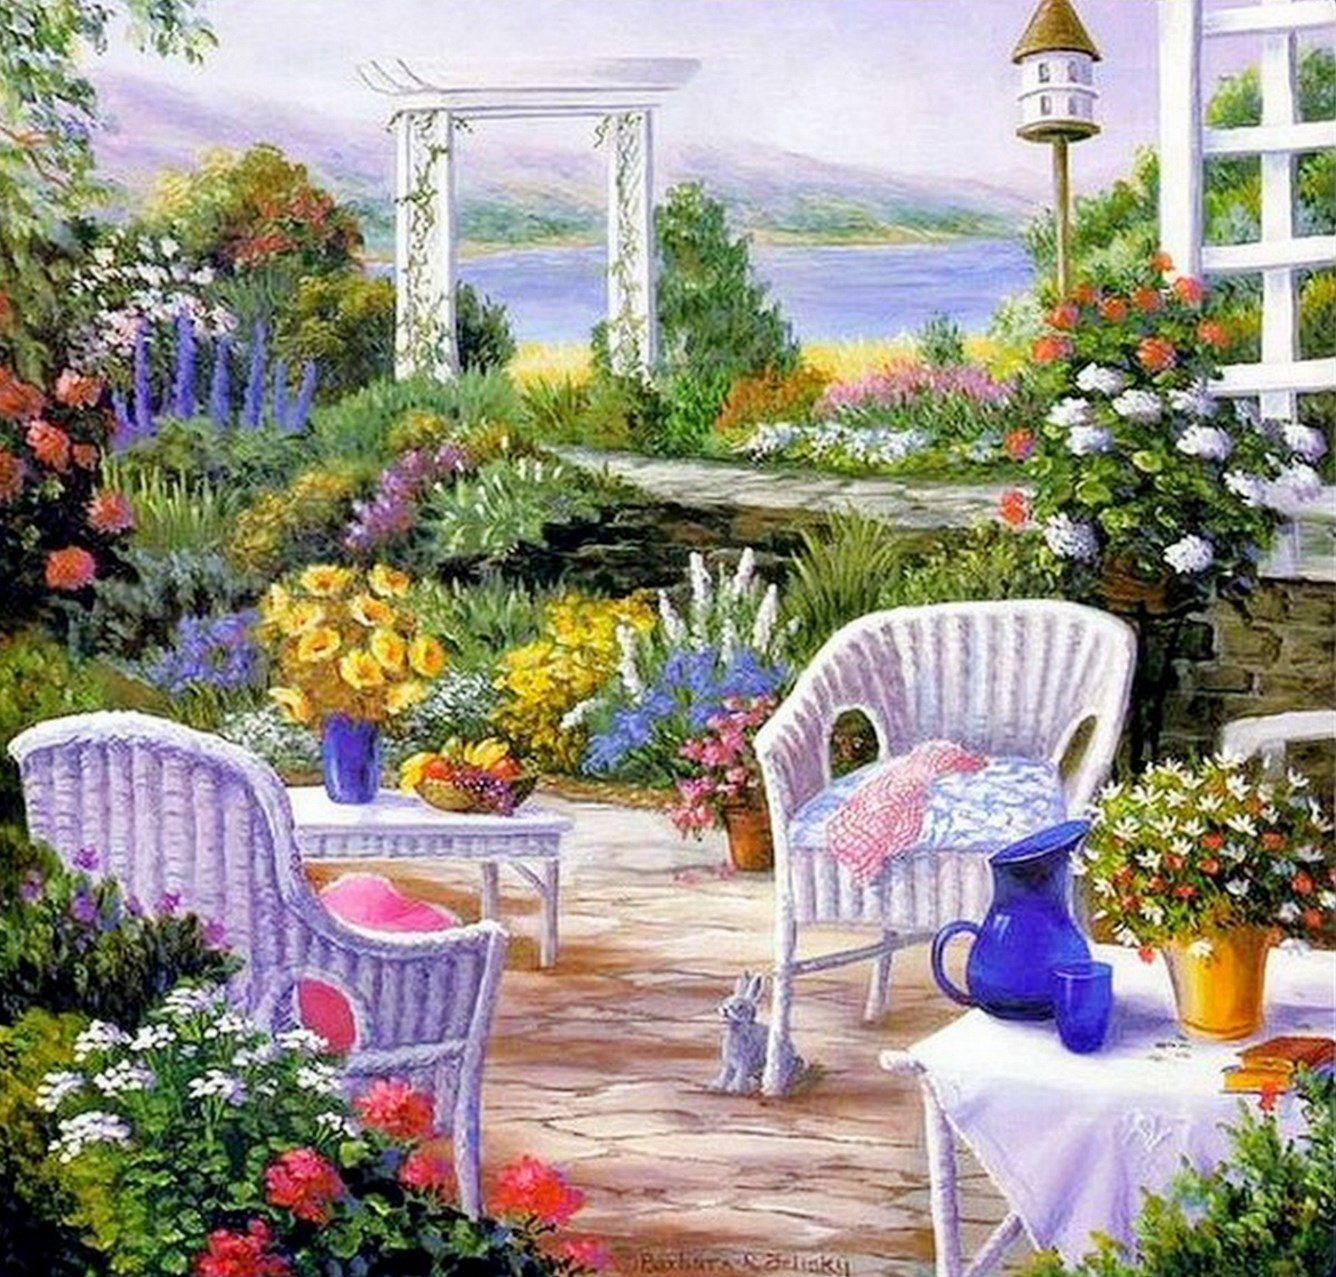 Cuadros modernos pinturas cuadros de casas con jardines for Casas con jardin enfrente